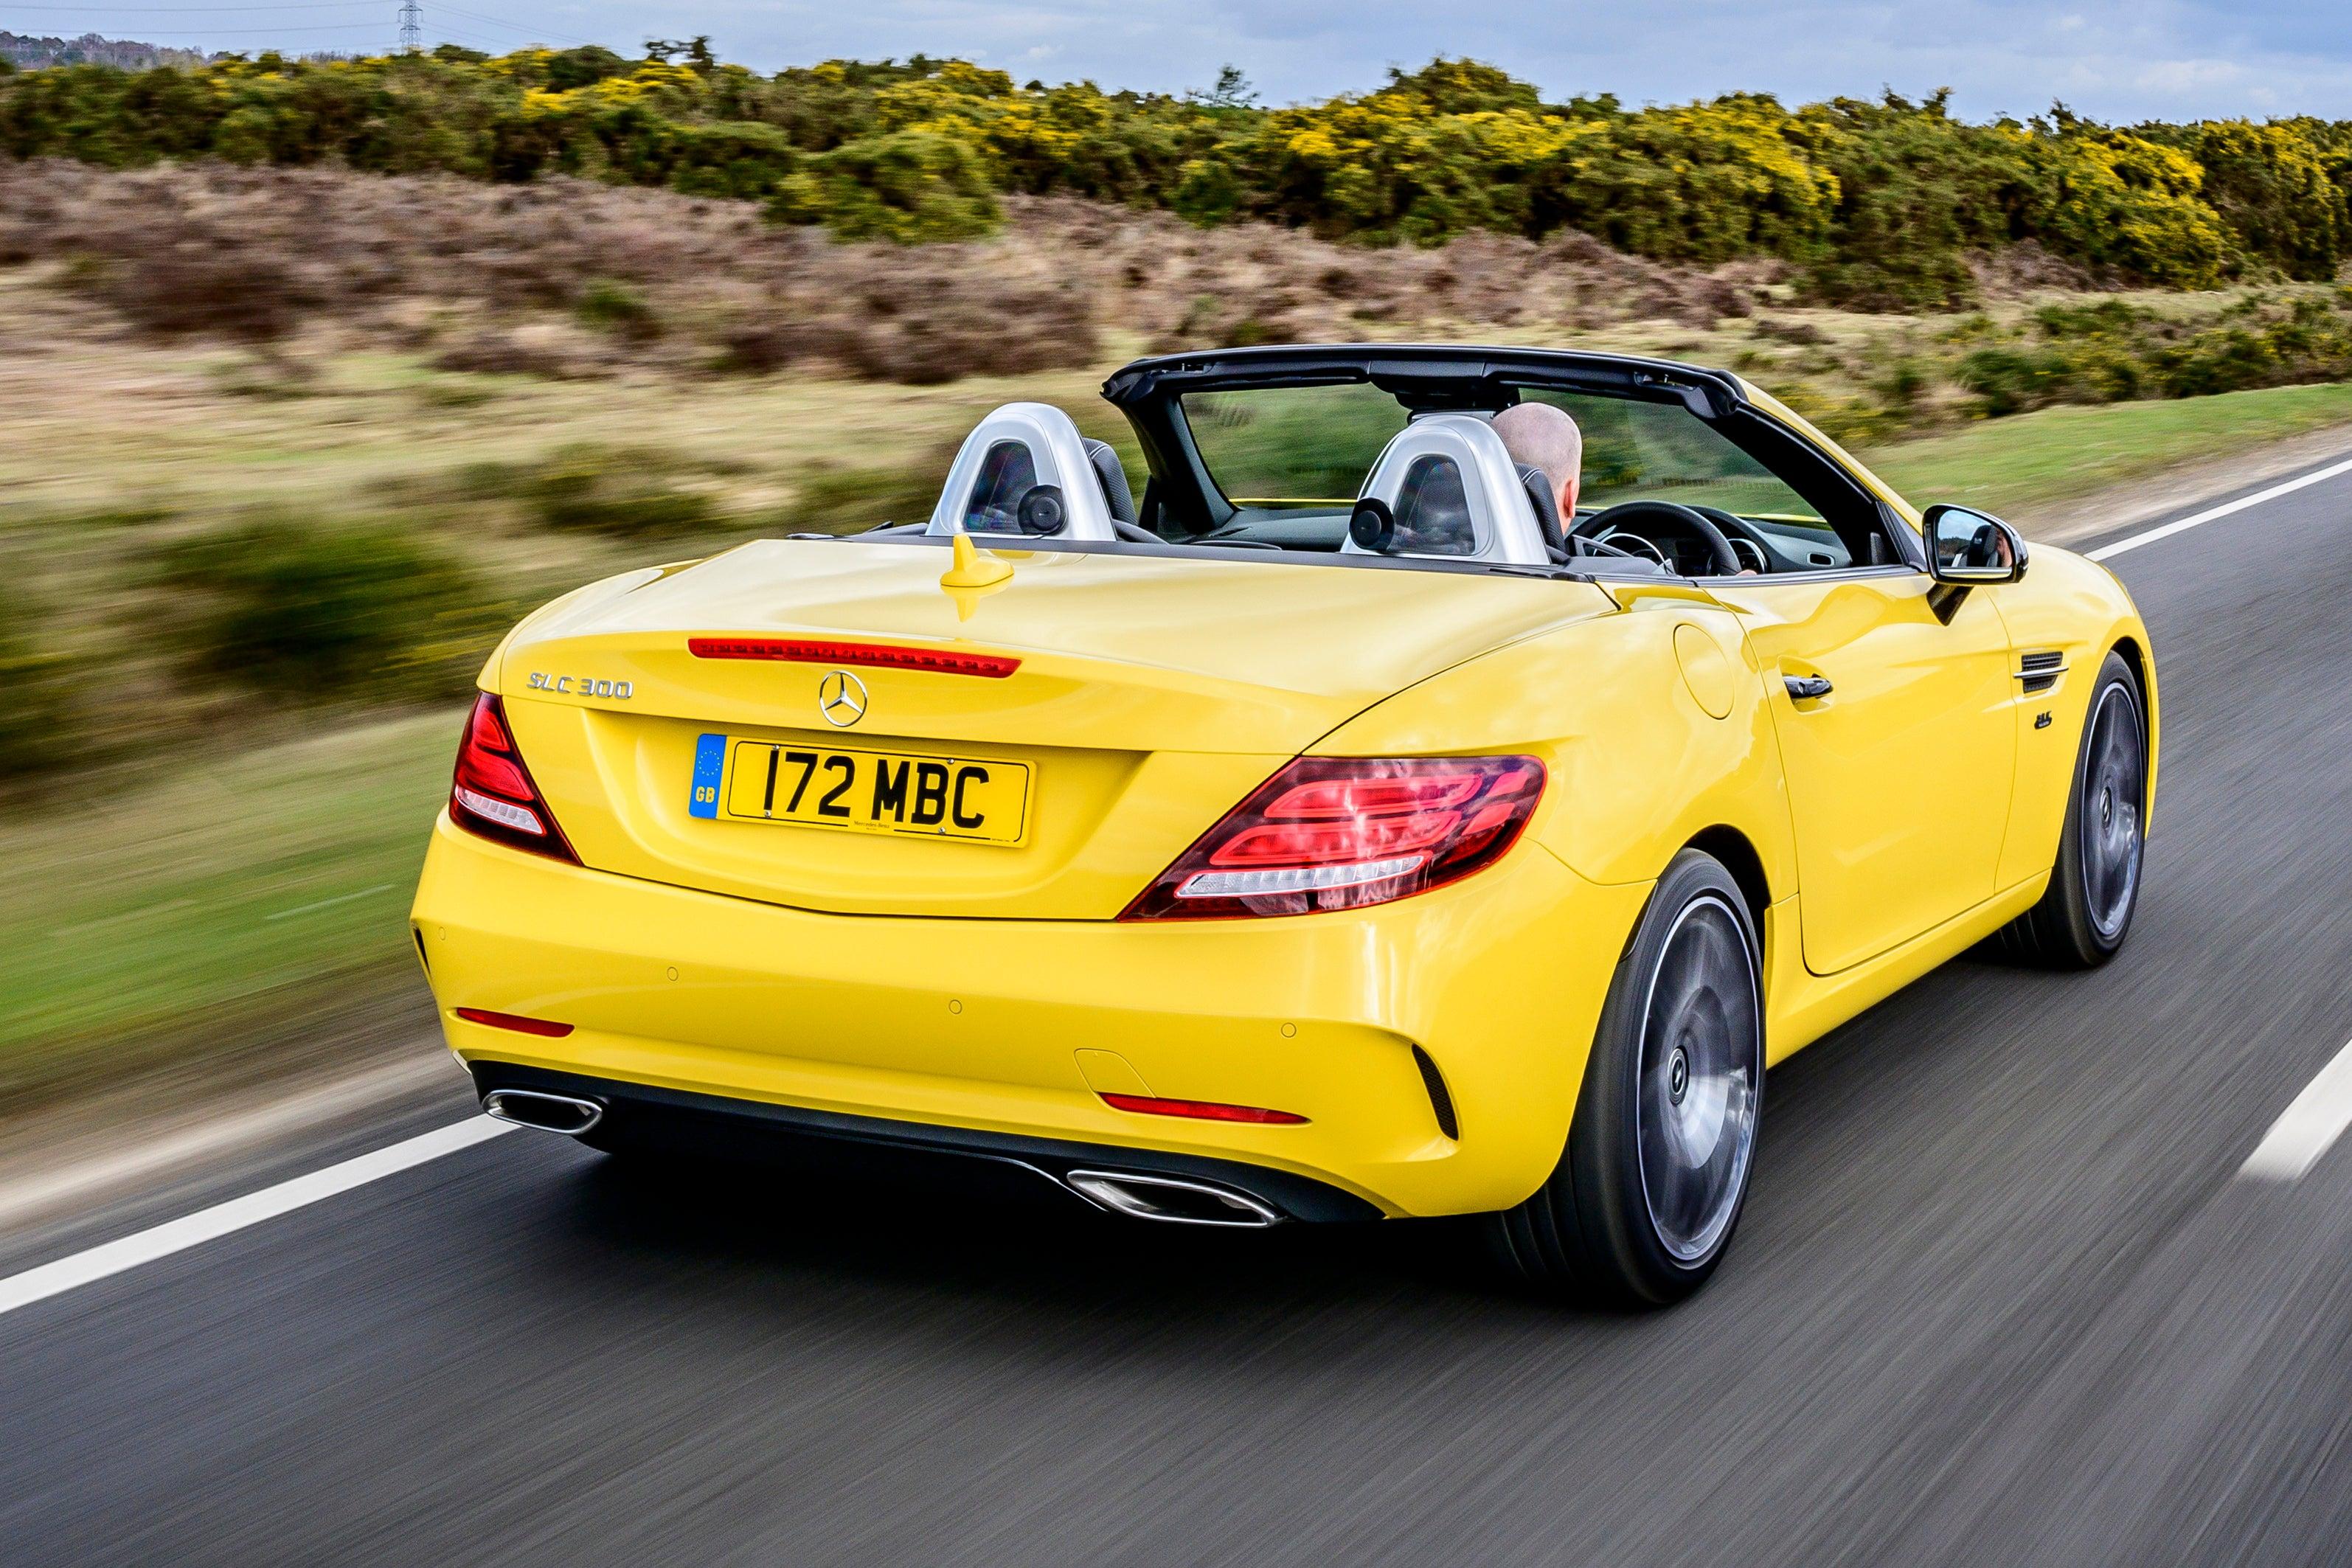 Mercedes SLC rear exterior